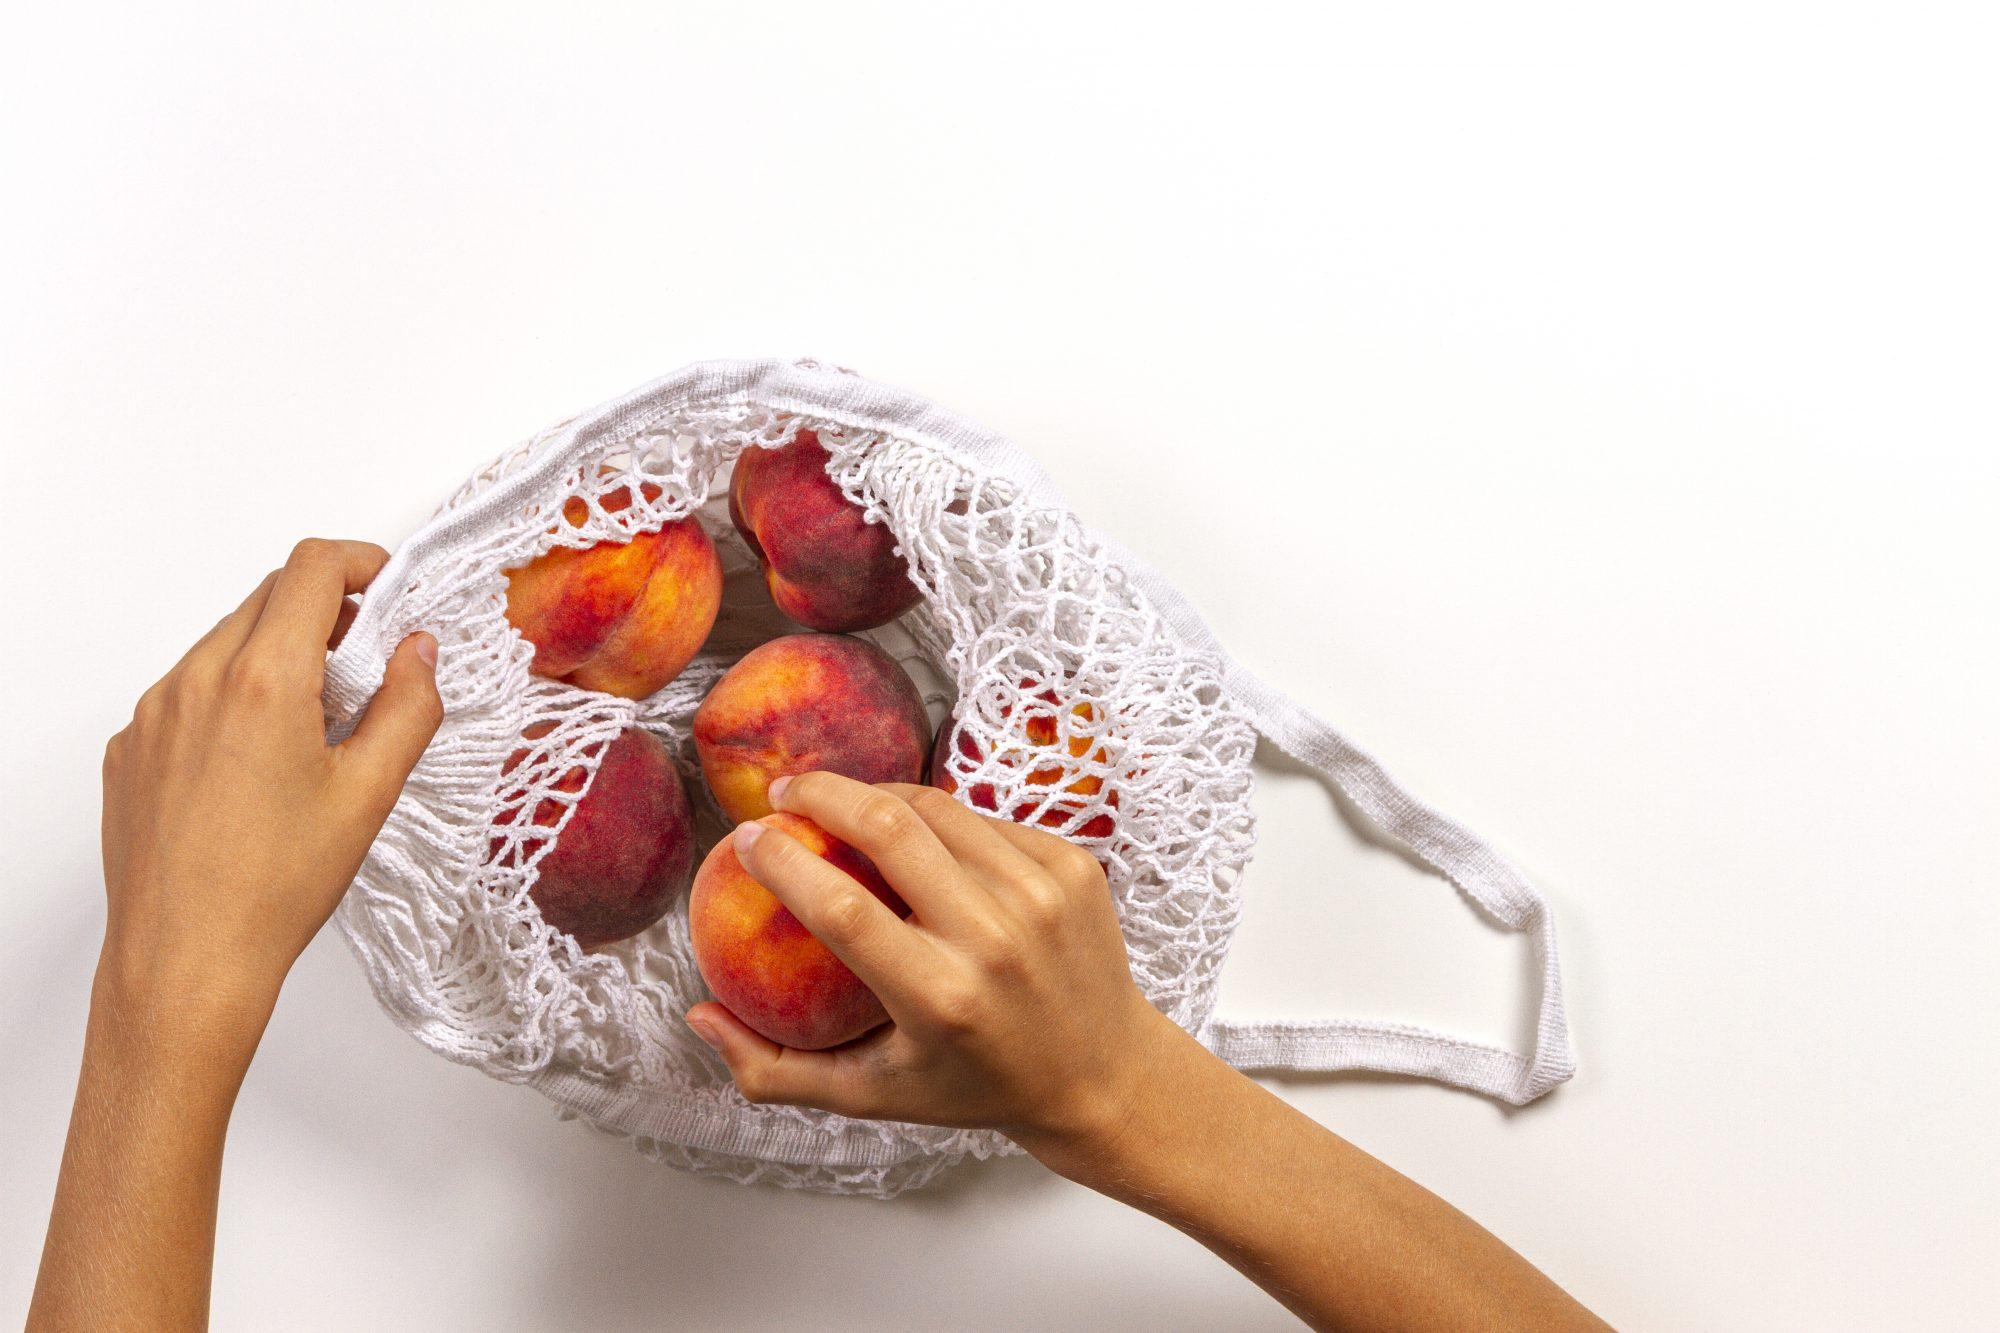 Peaches in bag Getty 8/5/20